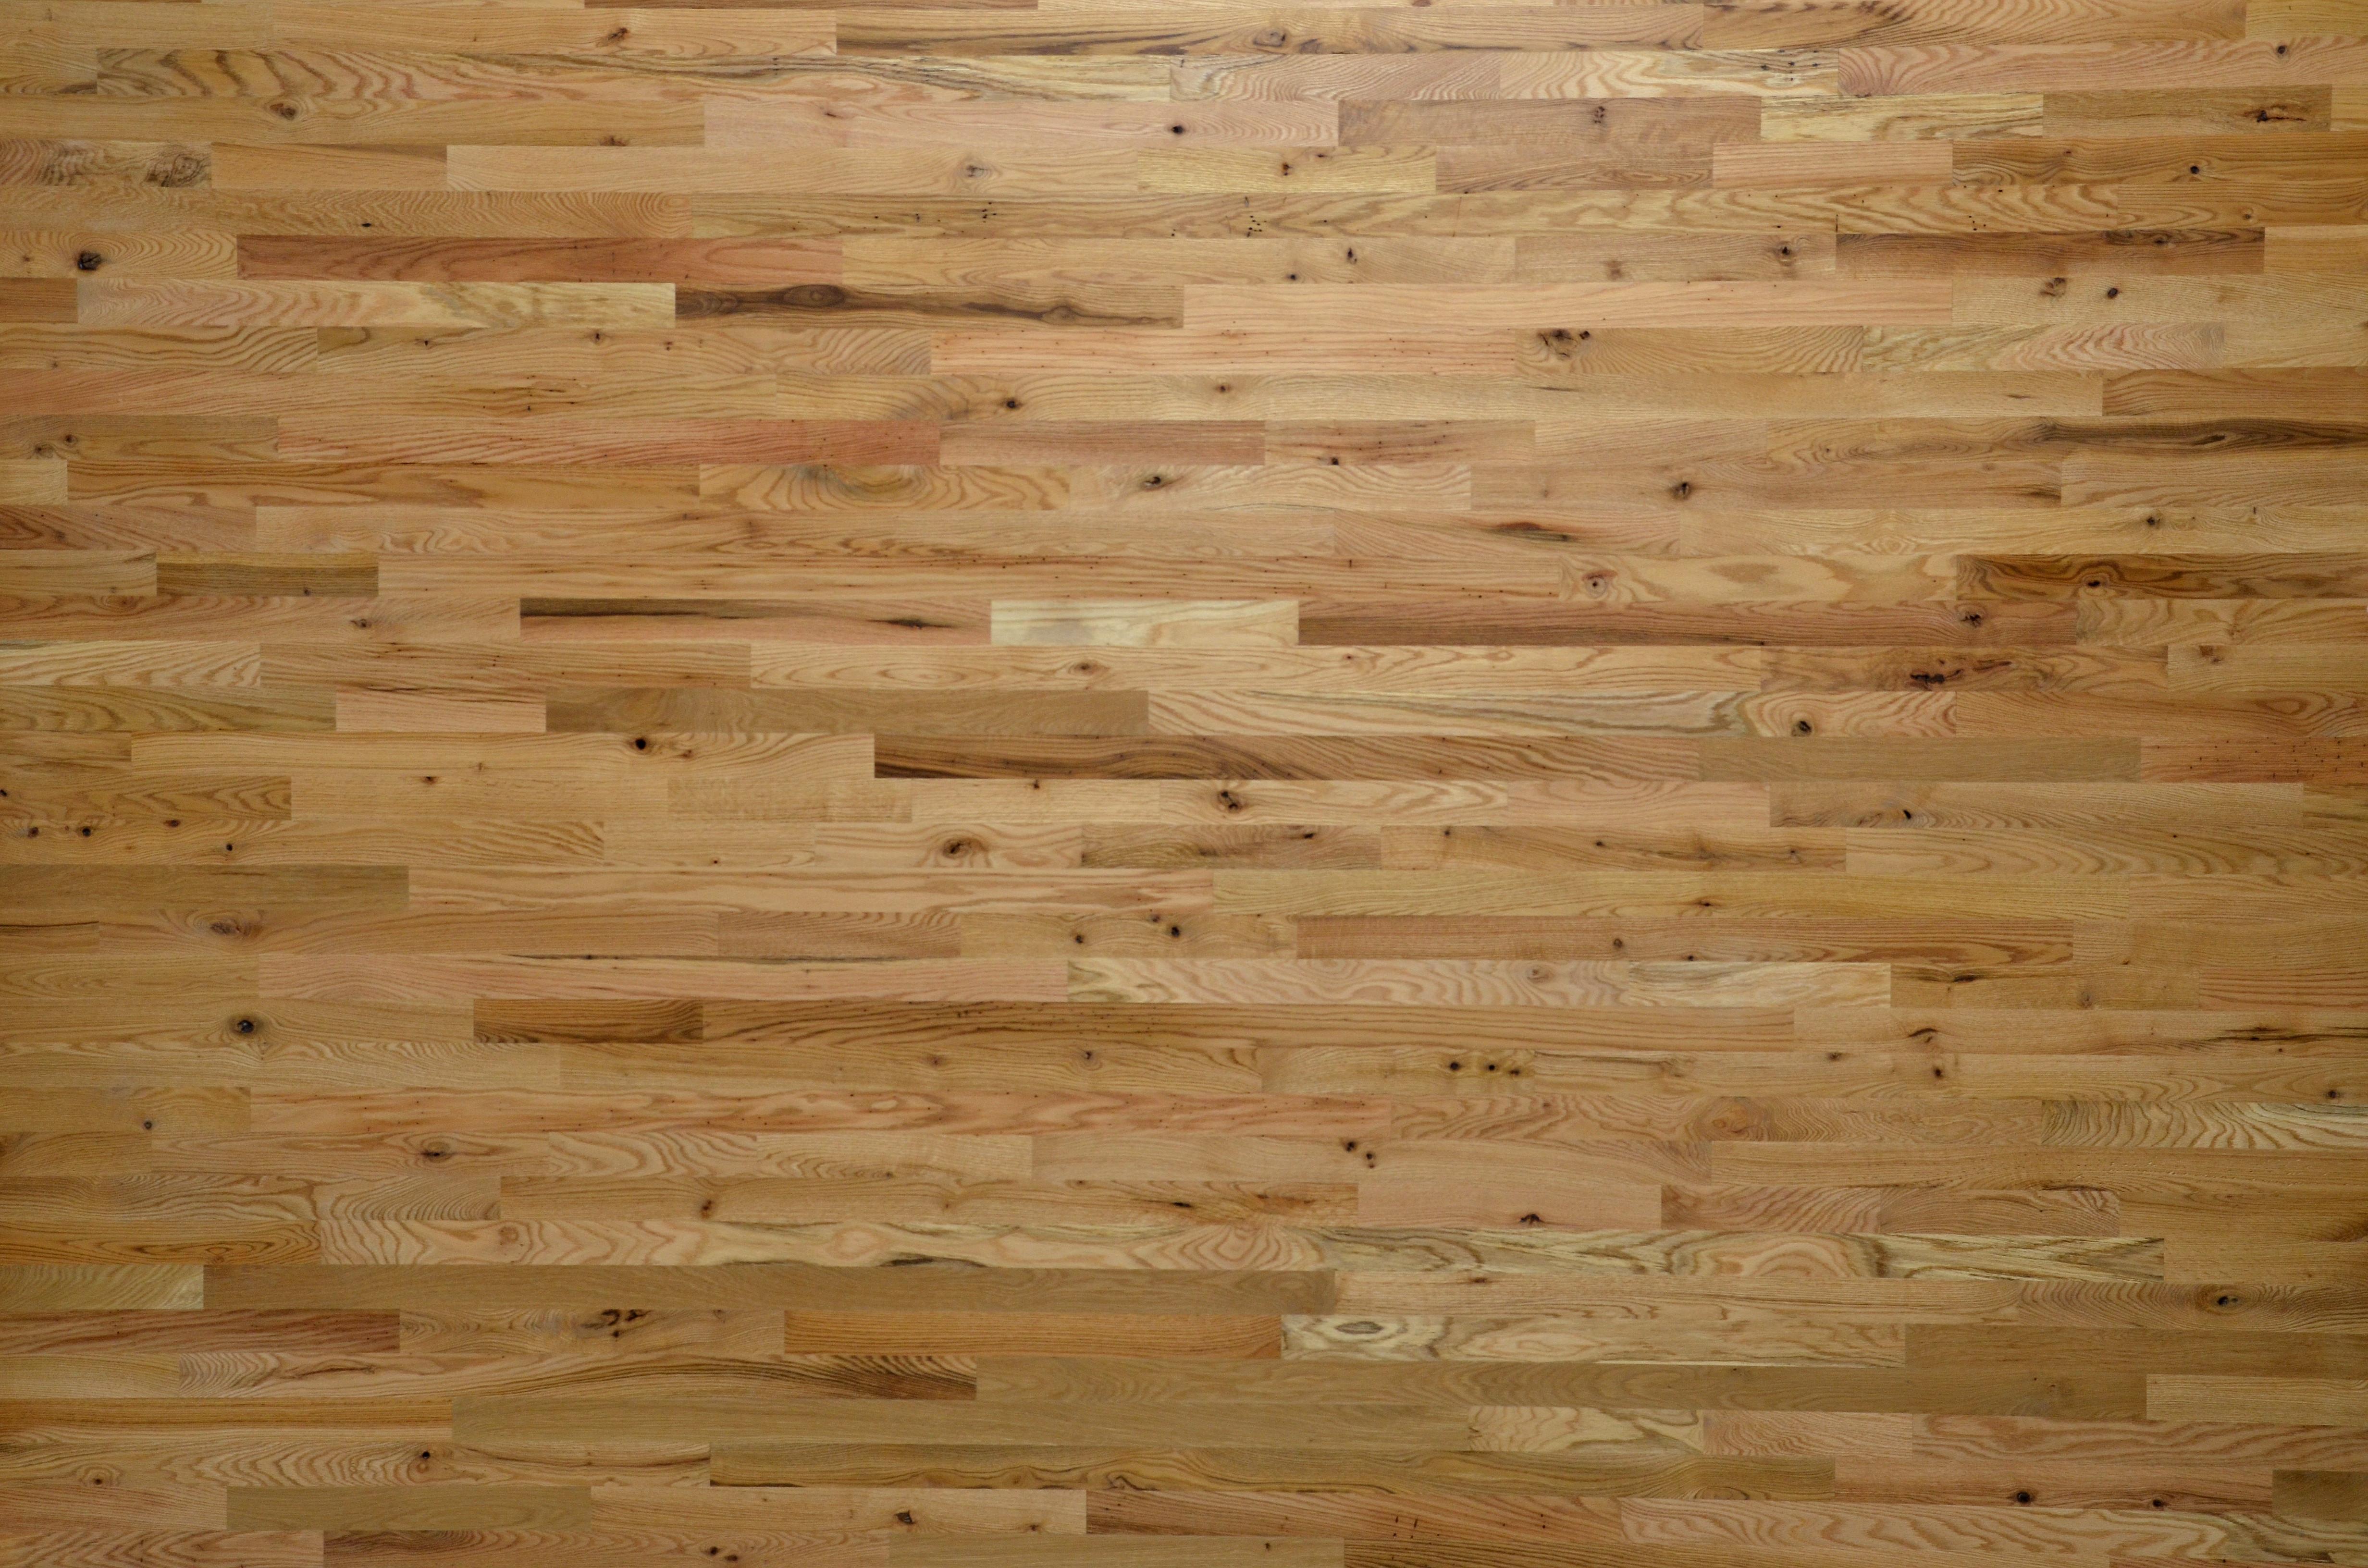 12 Unique 5 Inch Oak Hardwood Flooring 2021 free download 5 inch oak hardwood flooring of lacrosse hardwood flooring walnut white oak red oak hickory intended for 2 common red oak